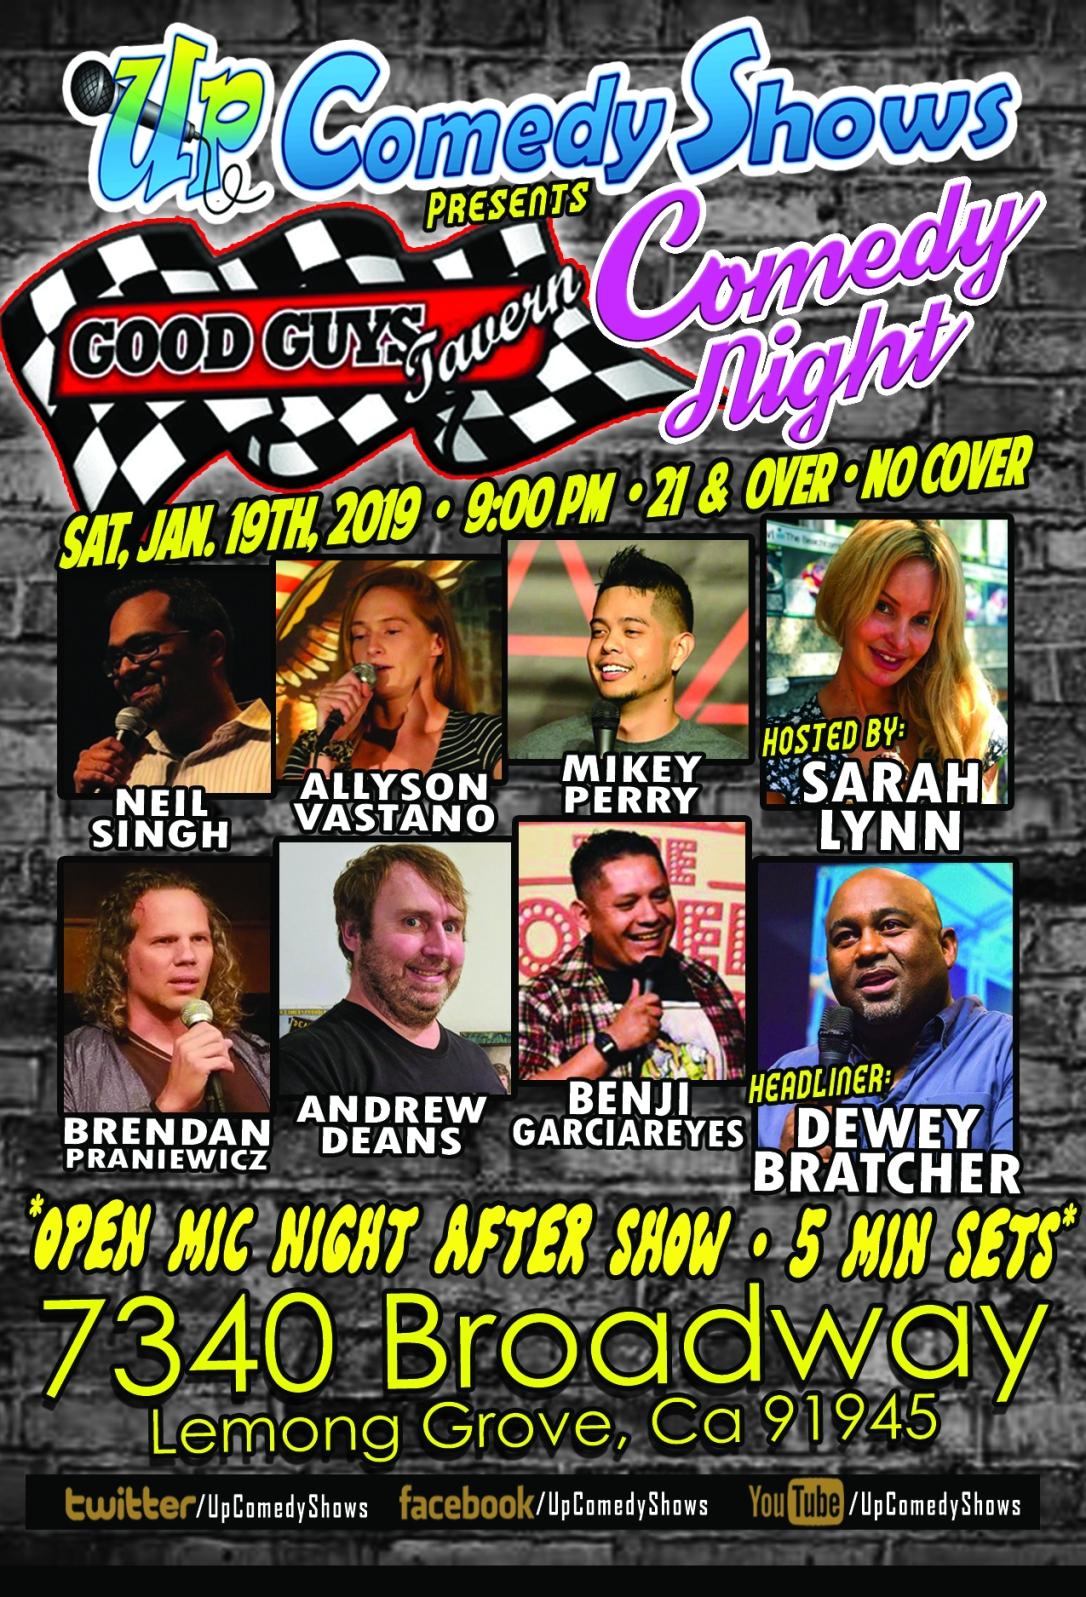 Good Guys Comedy Night - 01.jpg